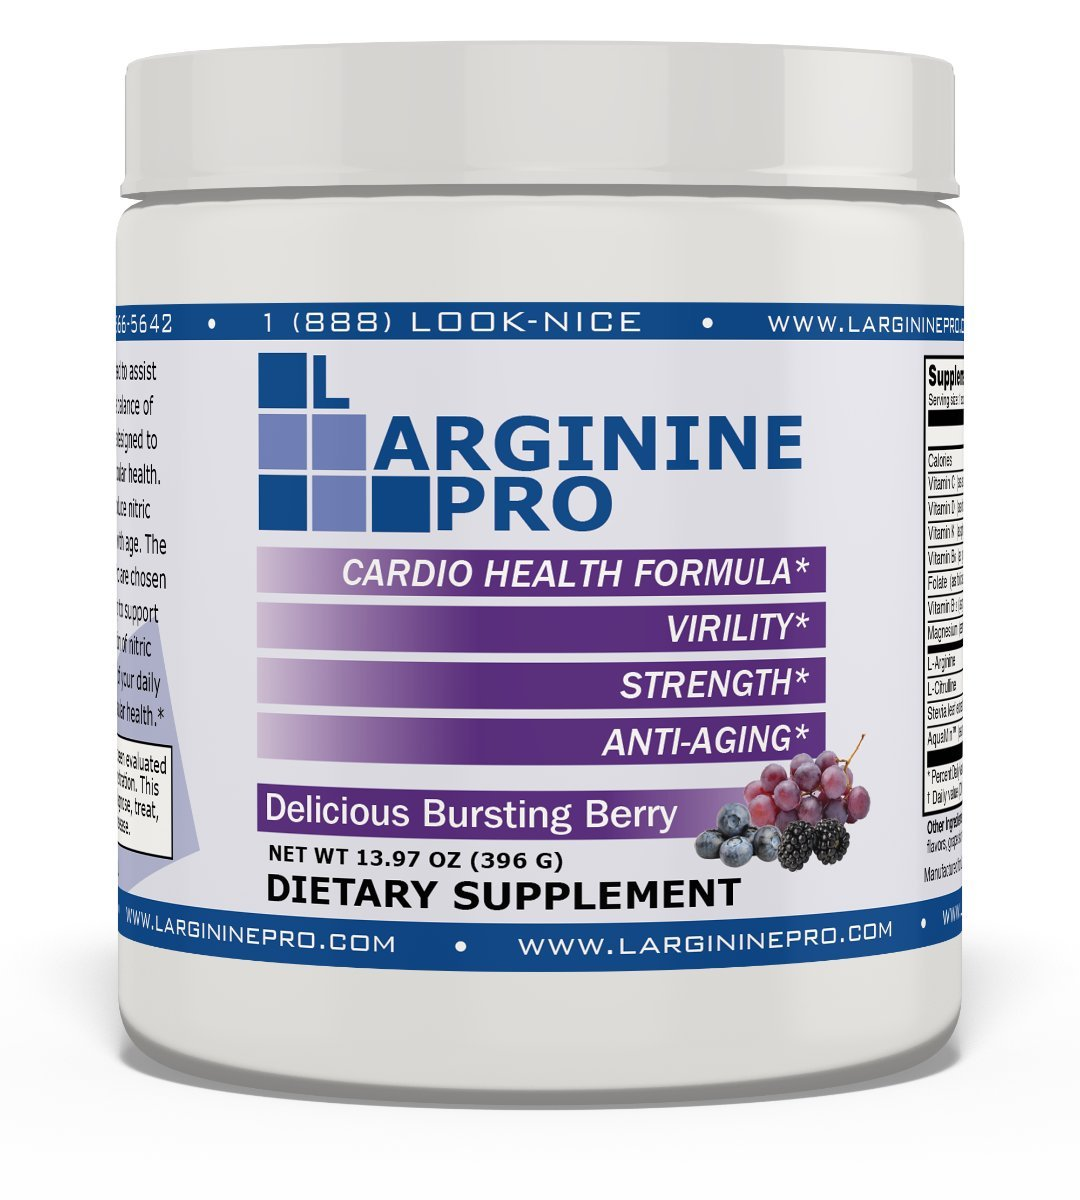 L-arginine Pro, 1 NOW L-arginine Supplement - 5,500mg of L-arginine PLUS 1,100mg L-Citrulline + Vitamins & Minerals for Cardio Health, Blood Pressure, Cholesterol, Energy (Berry, 3 Jars) by L-arginine Pro (Image #2)